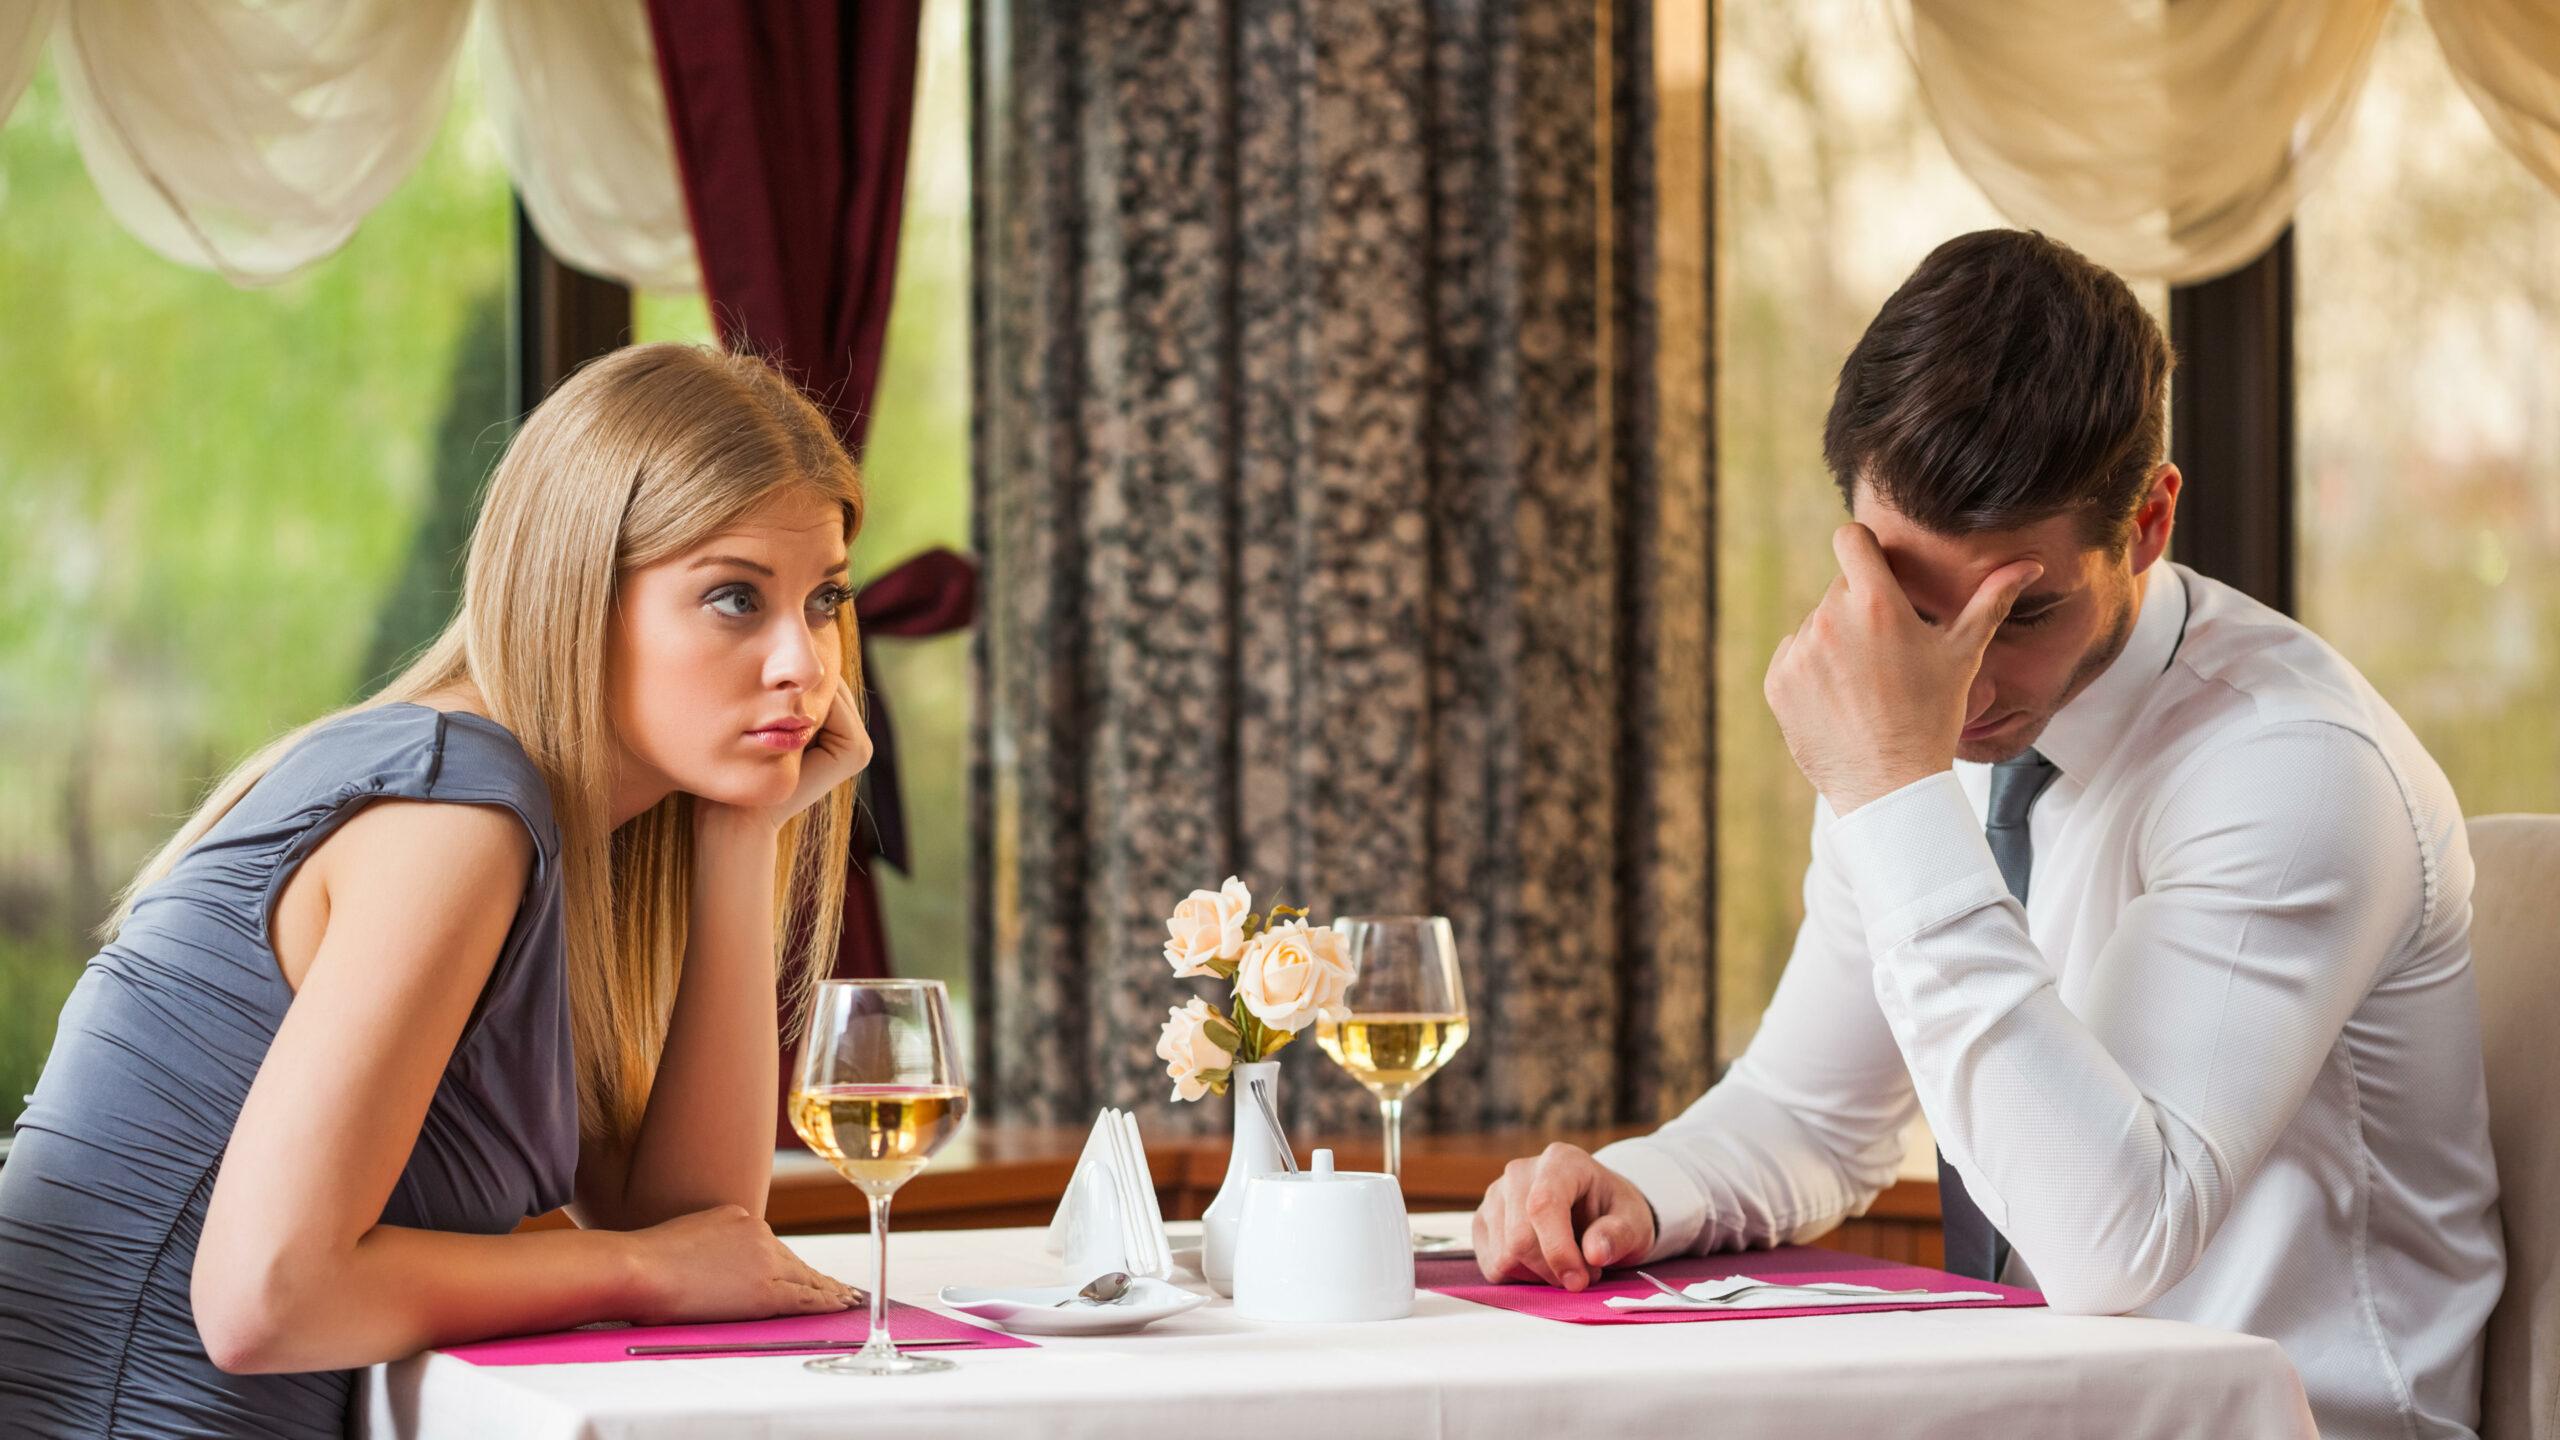 Worst restaurants on a first date